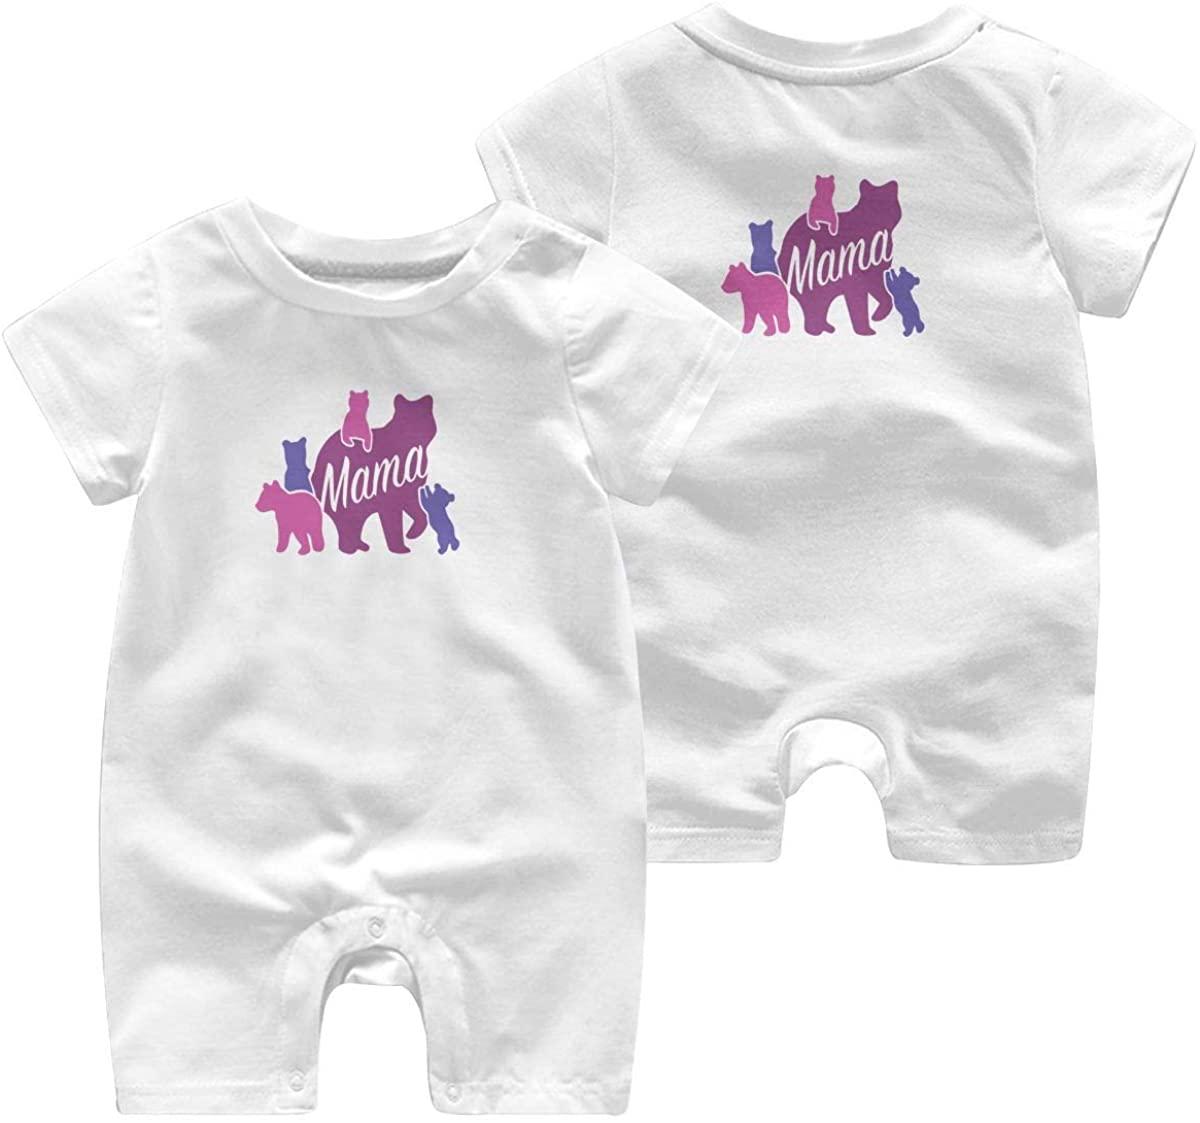 Mama Bear Leisure Baby Short Sleeve Jumpsuit Kid Breathable Baby Pajama Sleeper Cotton Romper